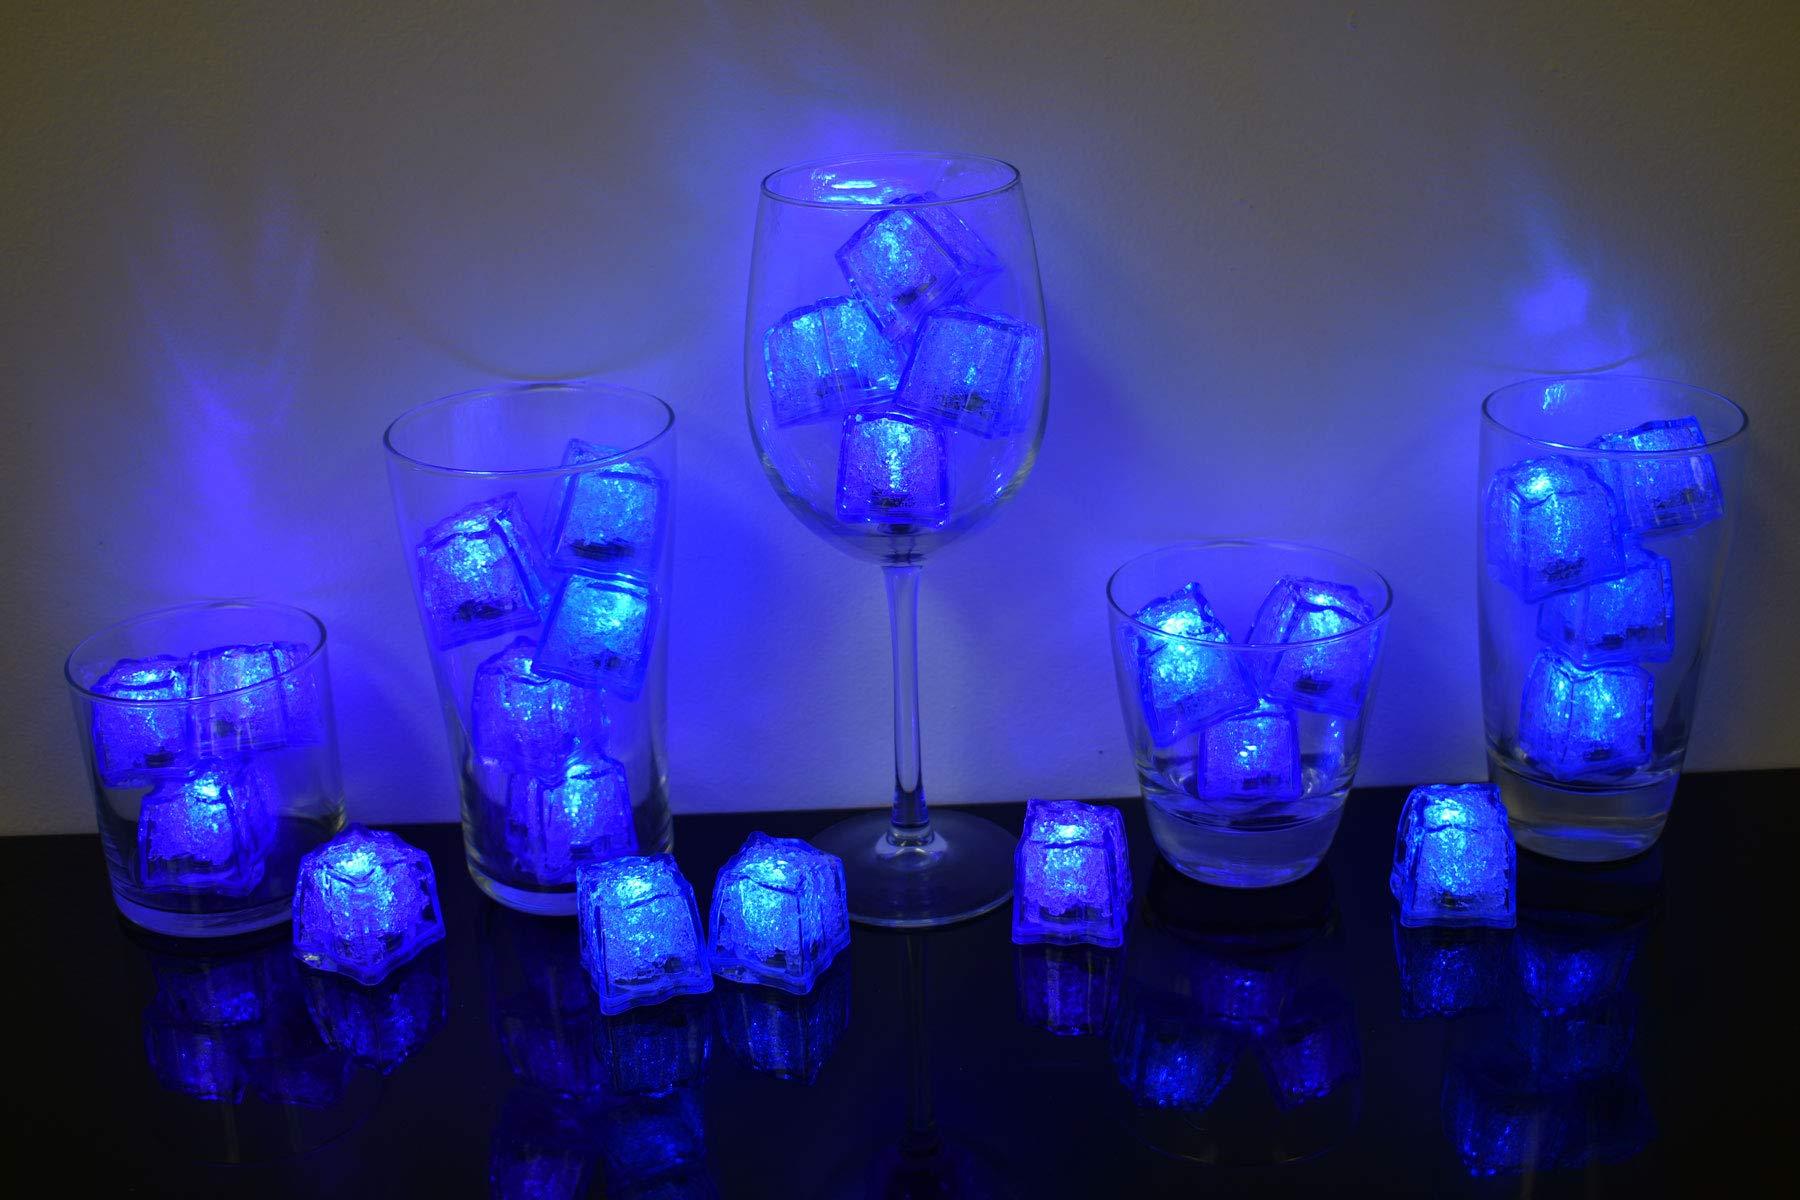 Litecubes Brand Jewel Color Tinted Sapphire Blue 3 Mode Light up LED Ice Cubes (24)